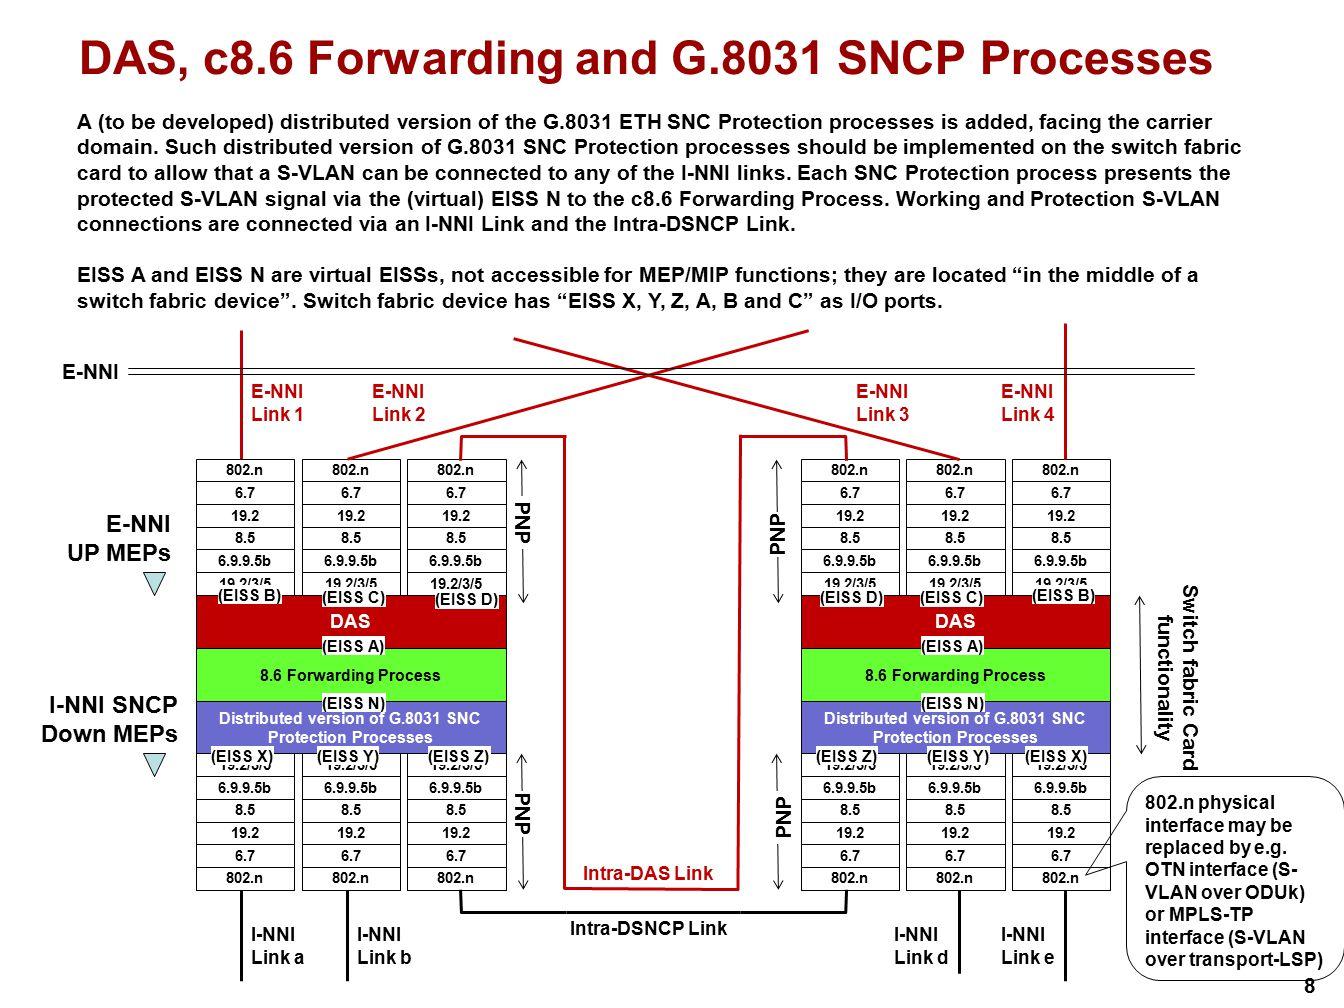 8 Distributed version of G.8031 SNC Protection Processes 19.2/3/5 6.9.9.5b 8.5 19.2 6.7 802.n 19.2/3/5 6.9.9.5b 8.5 19.2 6.7 802.n 19.2/3/5 6.9.9.5b 8